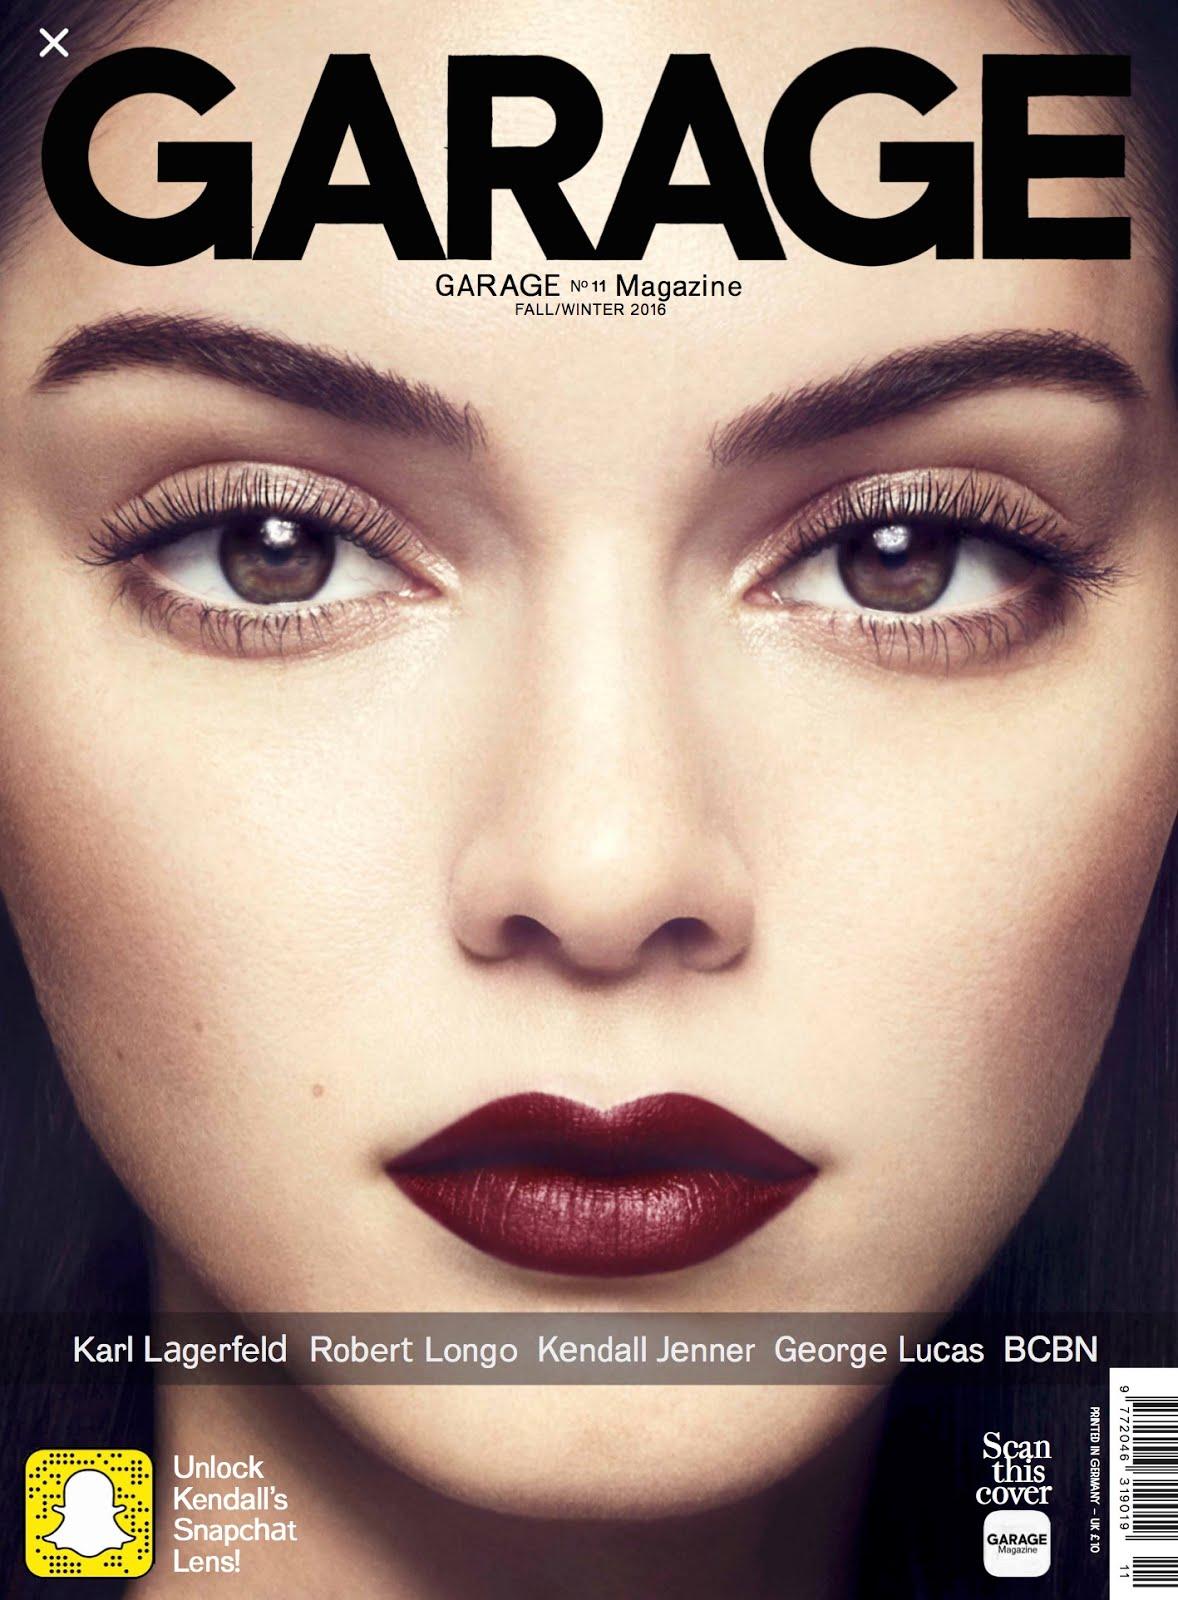 Garage Magazine Snapchat Code, Secret Filters, Willow Smith